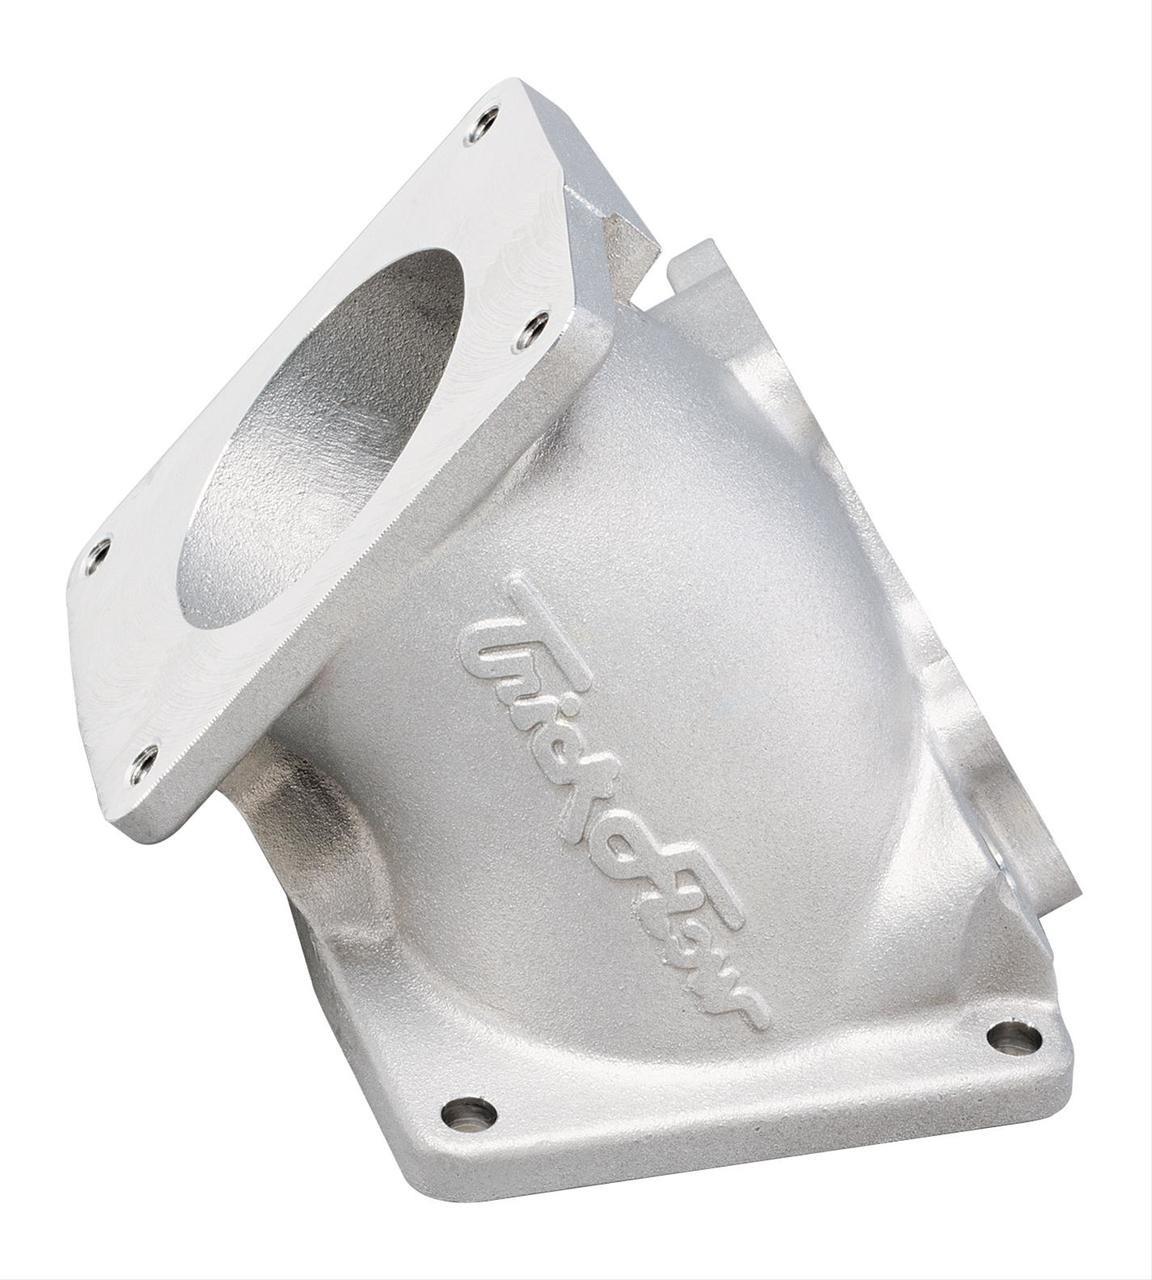 BBK 1524 75mm Throttle Body High Flow Power Plus Series for Ford Mustang 5.0L